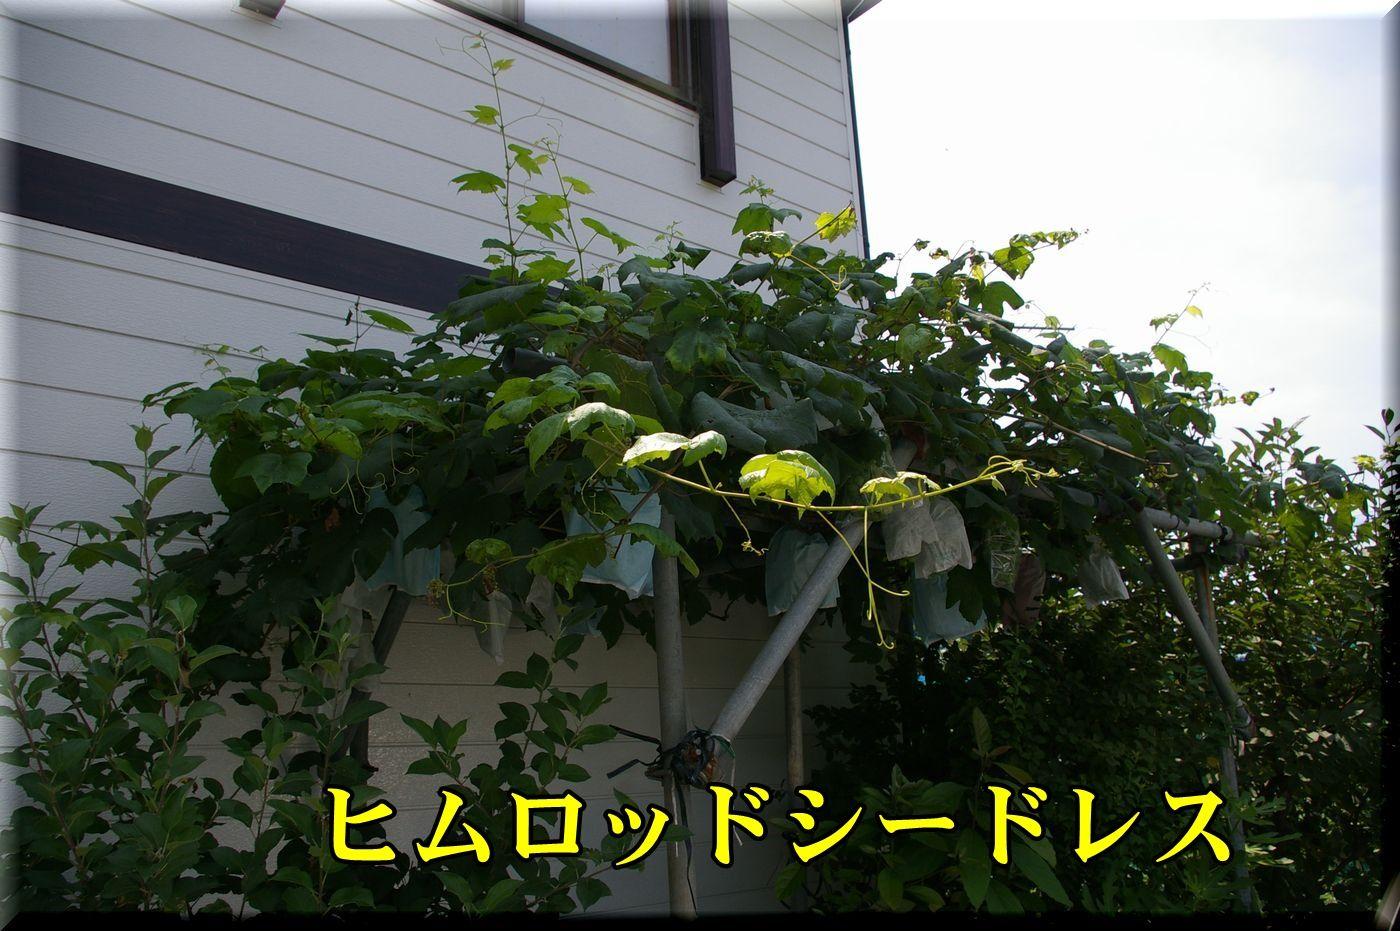 1himurodo160720_001.jpg